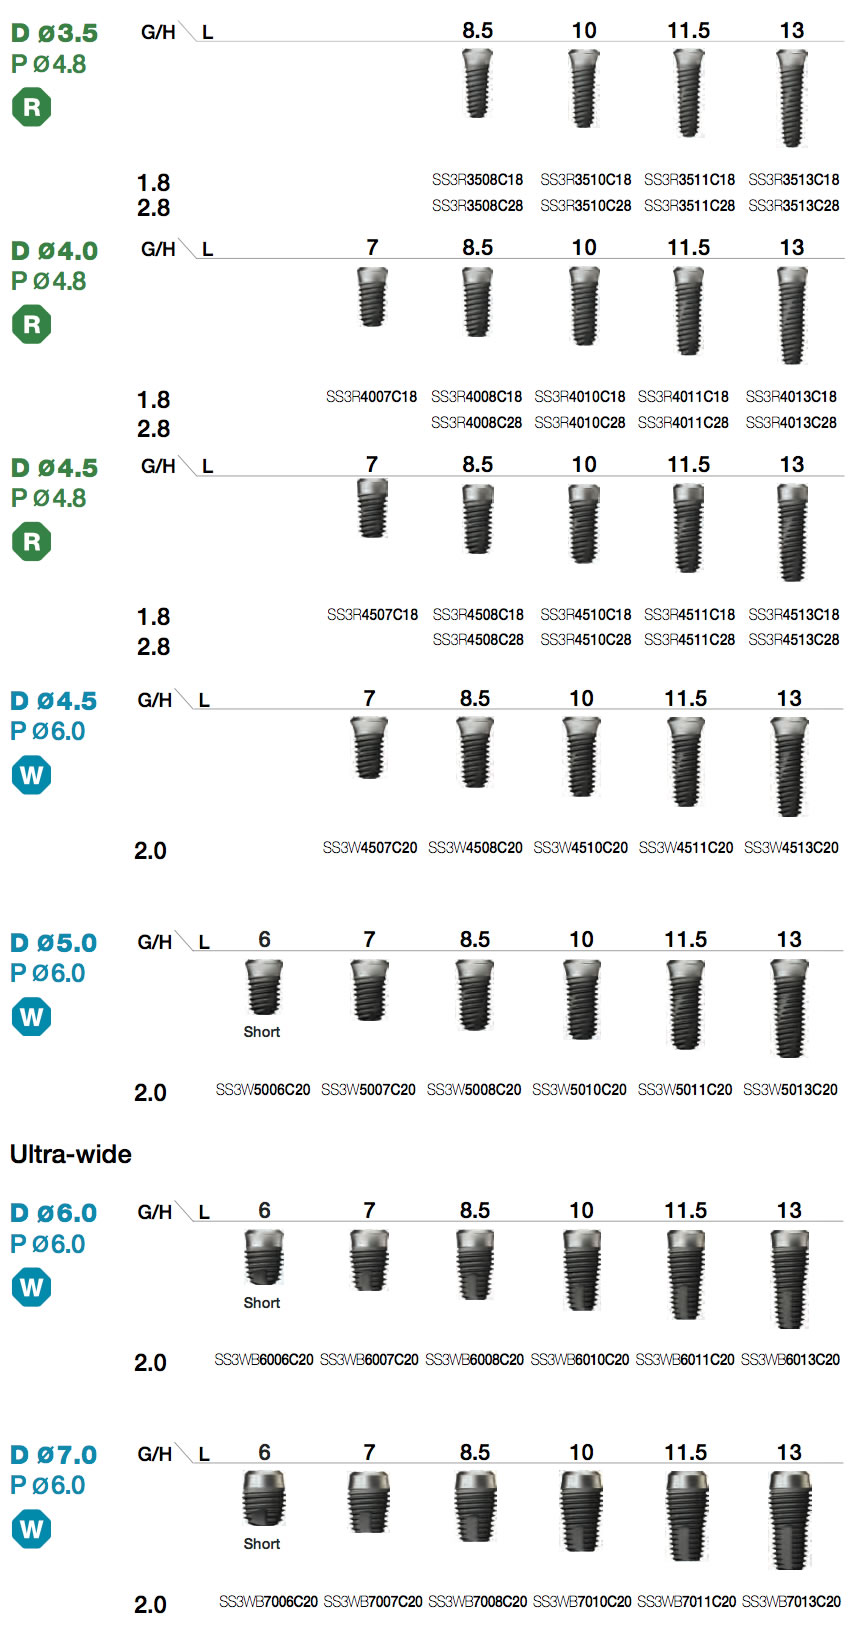 SSIII CA Fixture Implant Types